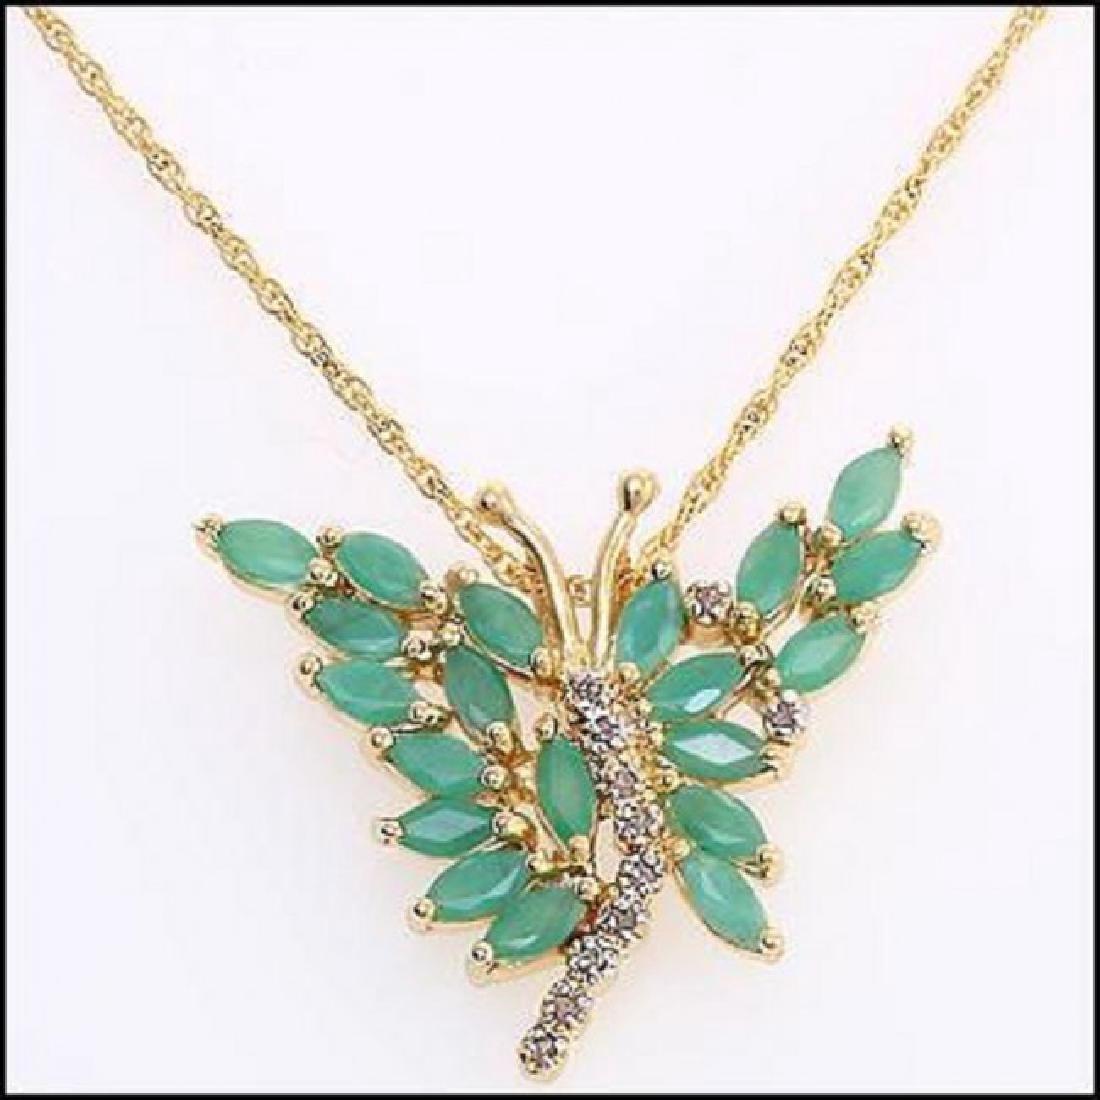 3.89 CT Green Agate & Diamond Designer Necklace $1180 - 2